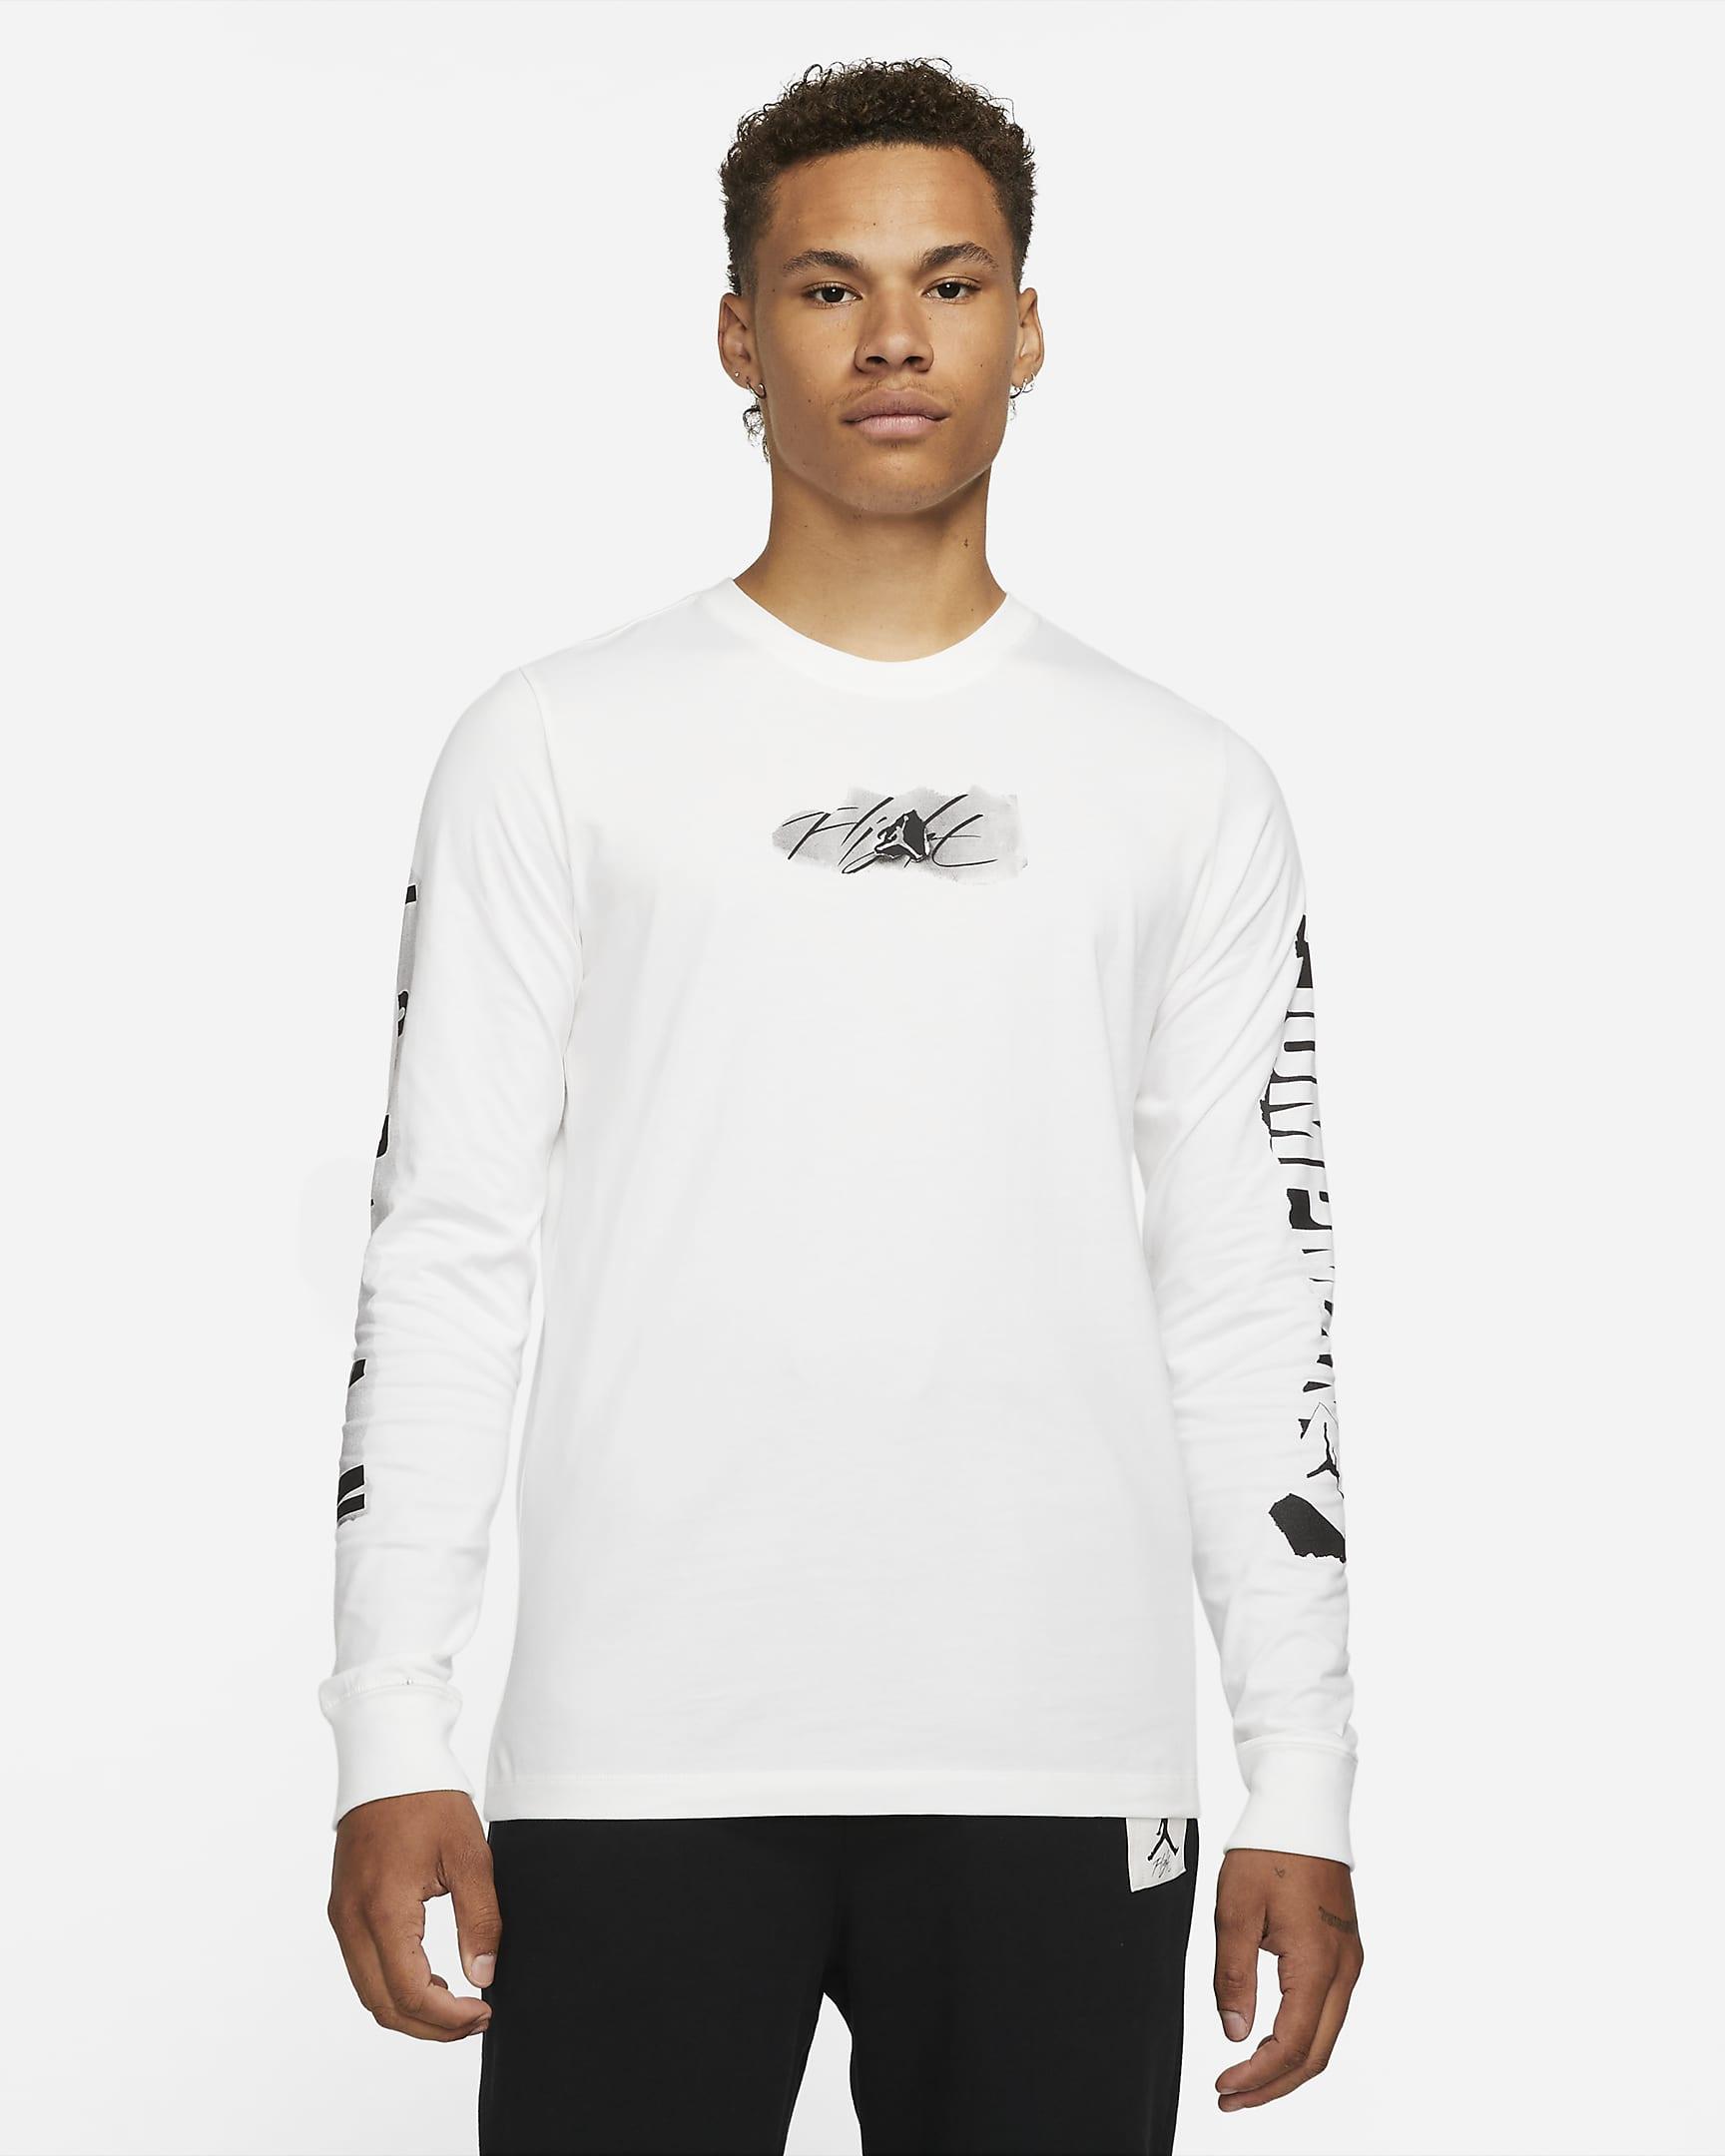 jordan-jumpman-mens-long-sleeve-t-shirt-2dMpXz.png